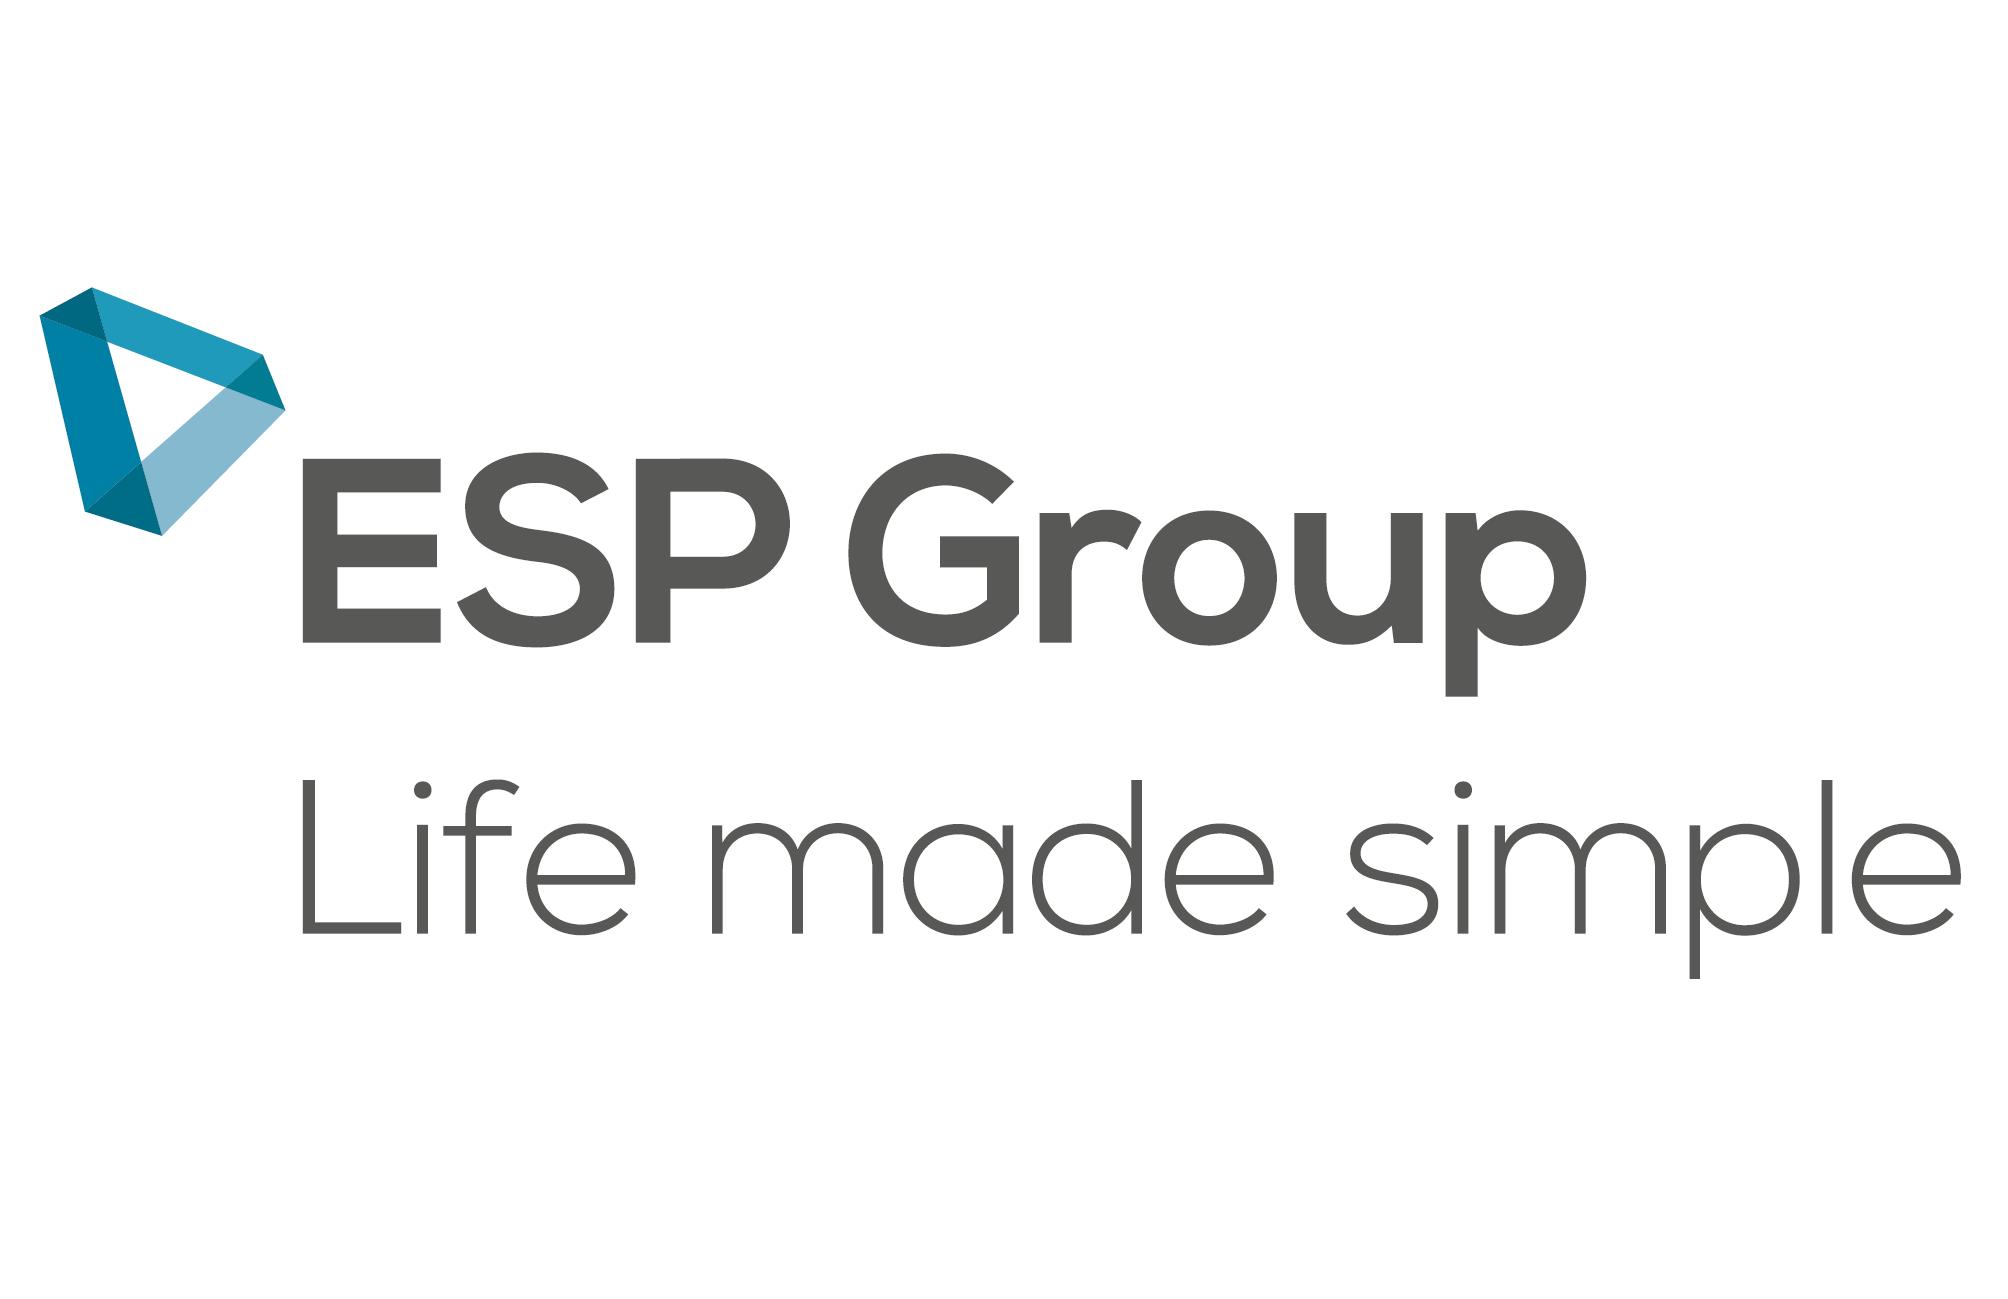 ESP Group company logo